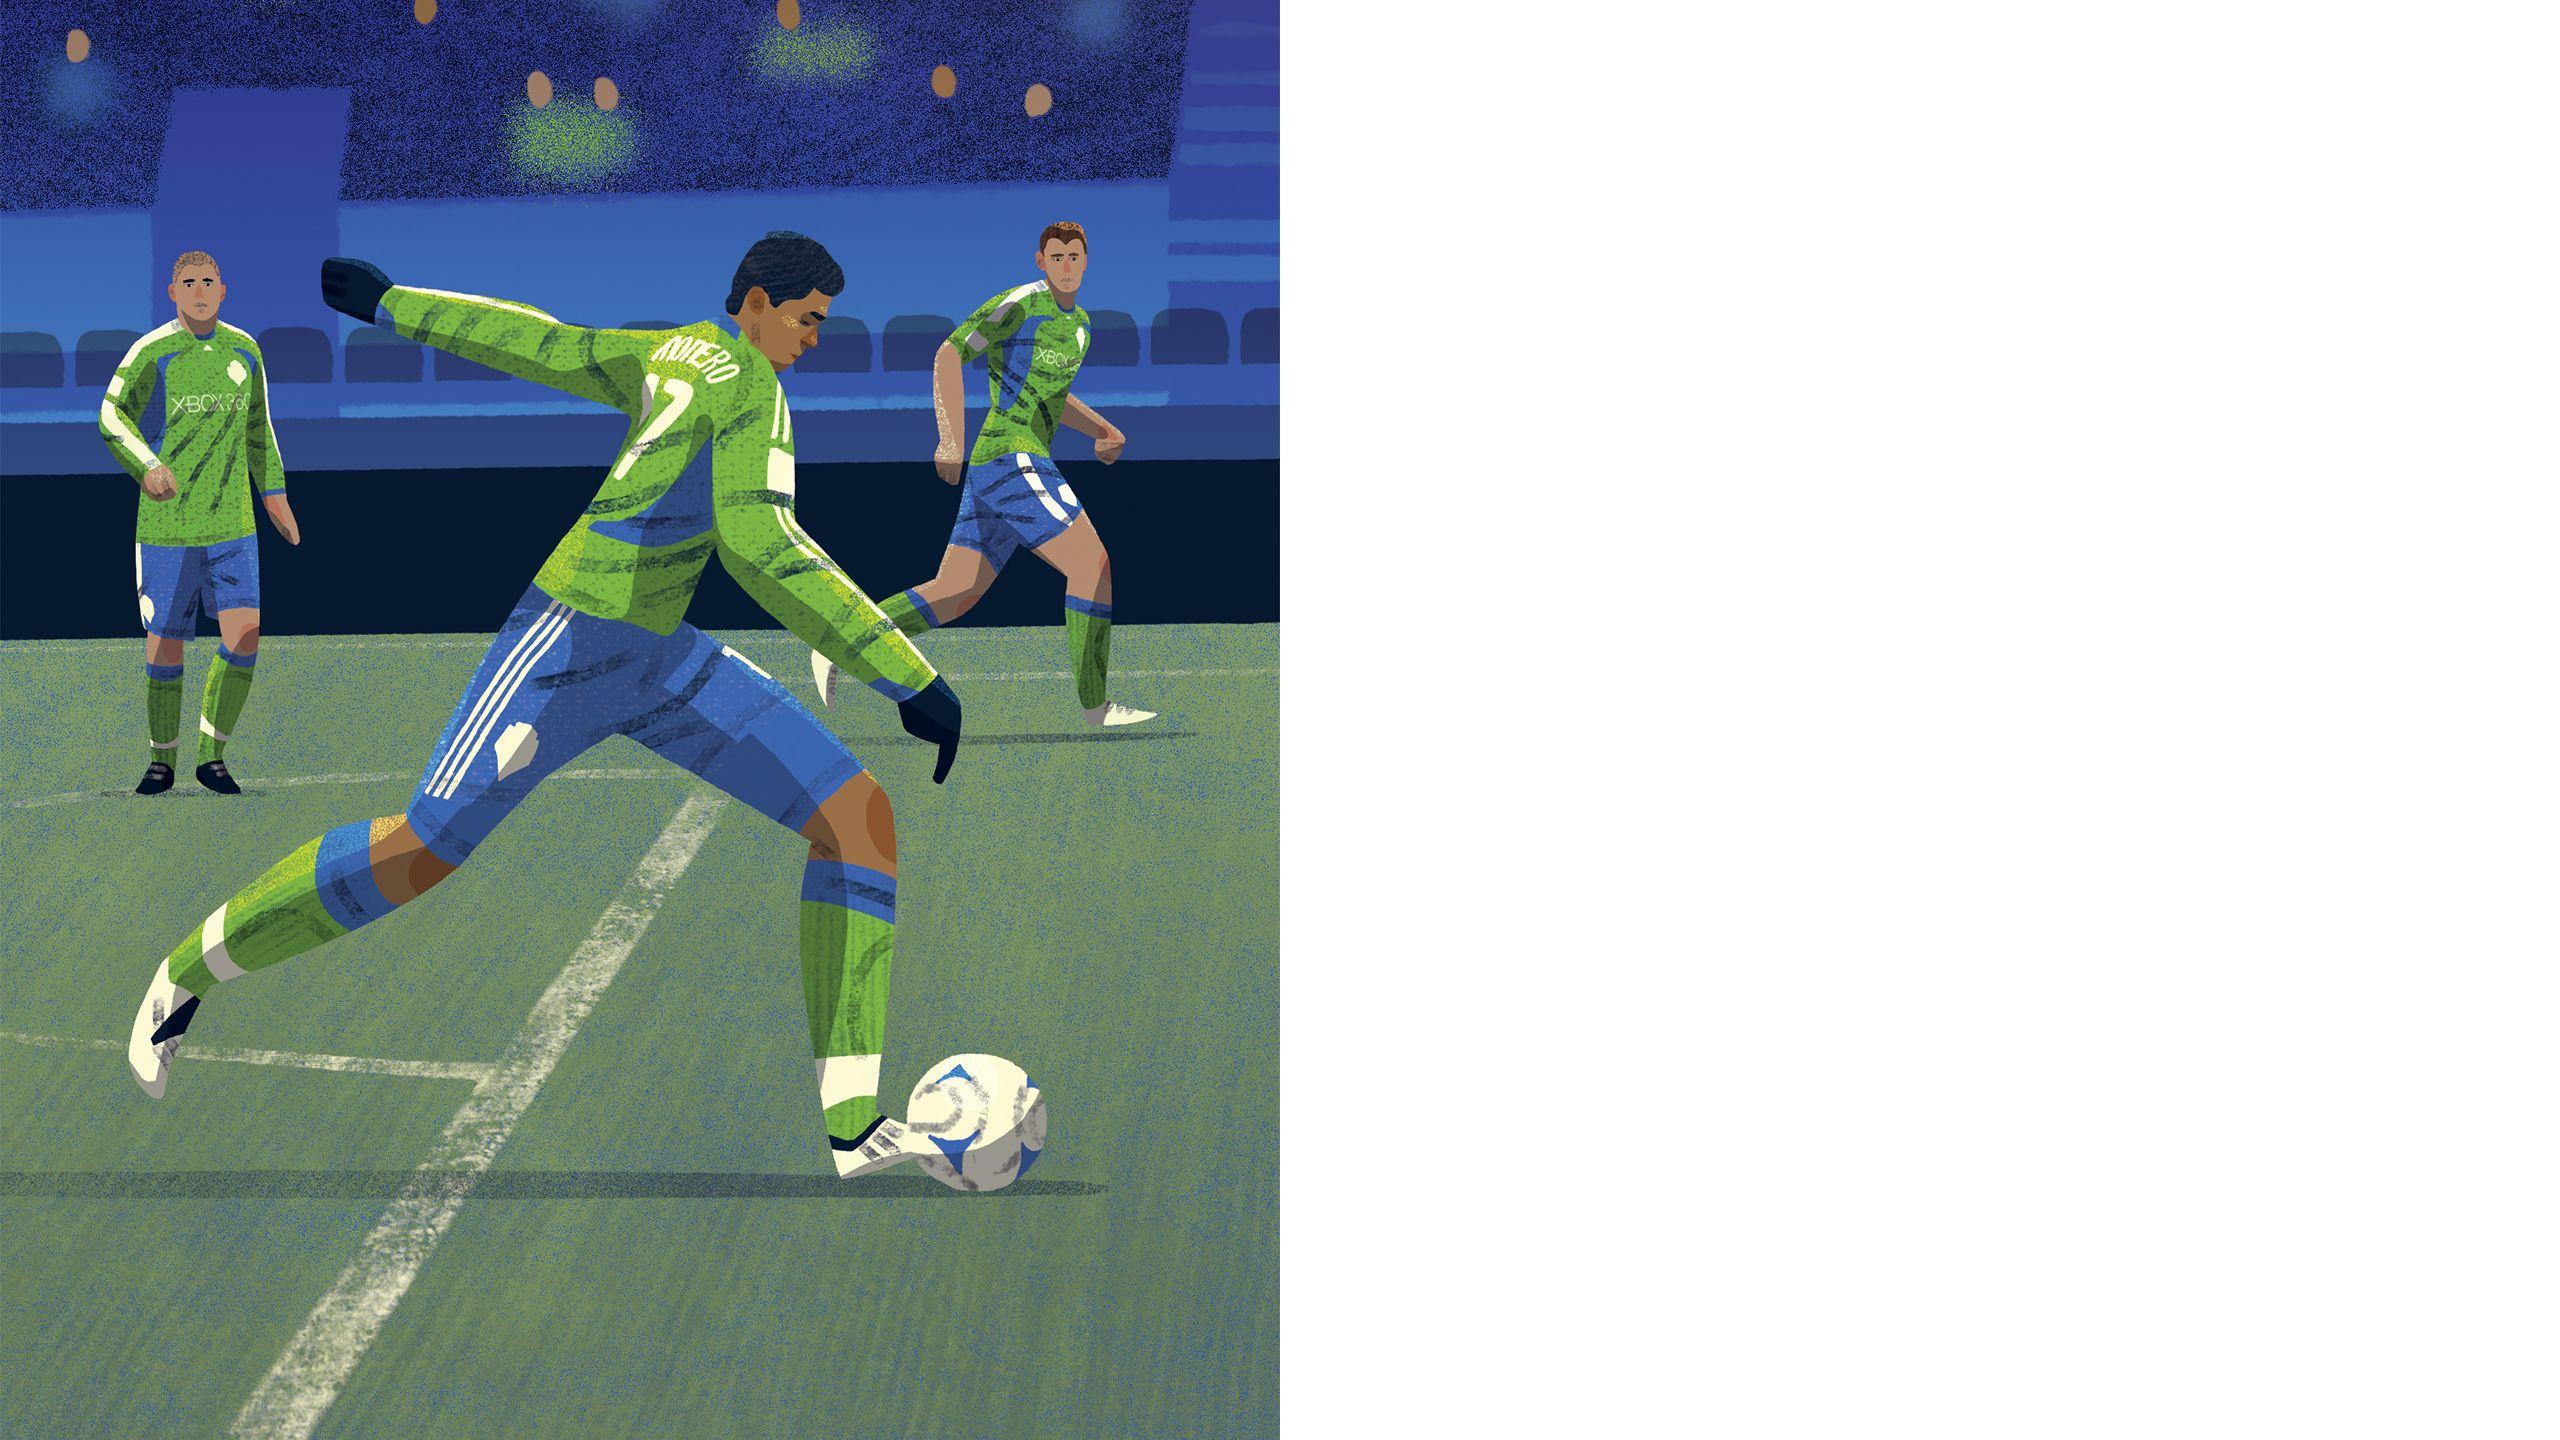 SFC10 - Sounders FC Celebrates 10 years in MLS | Seattle